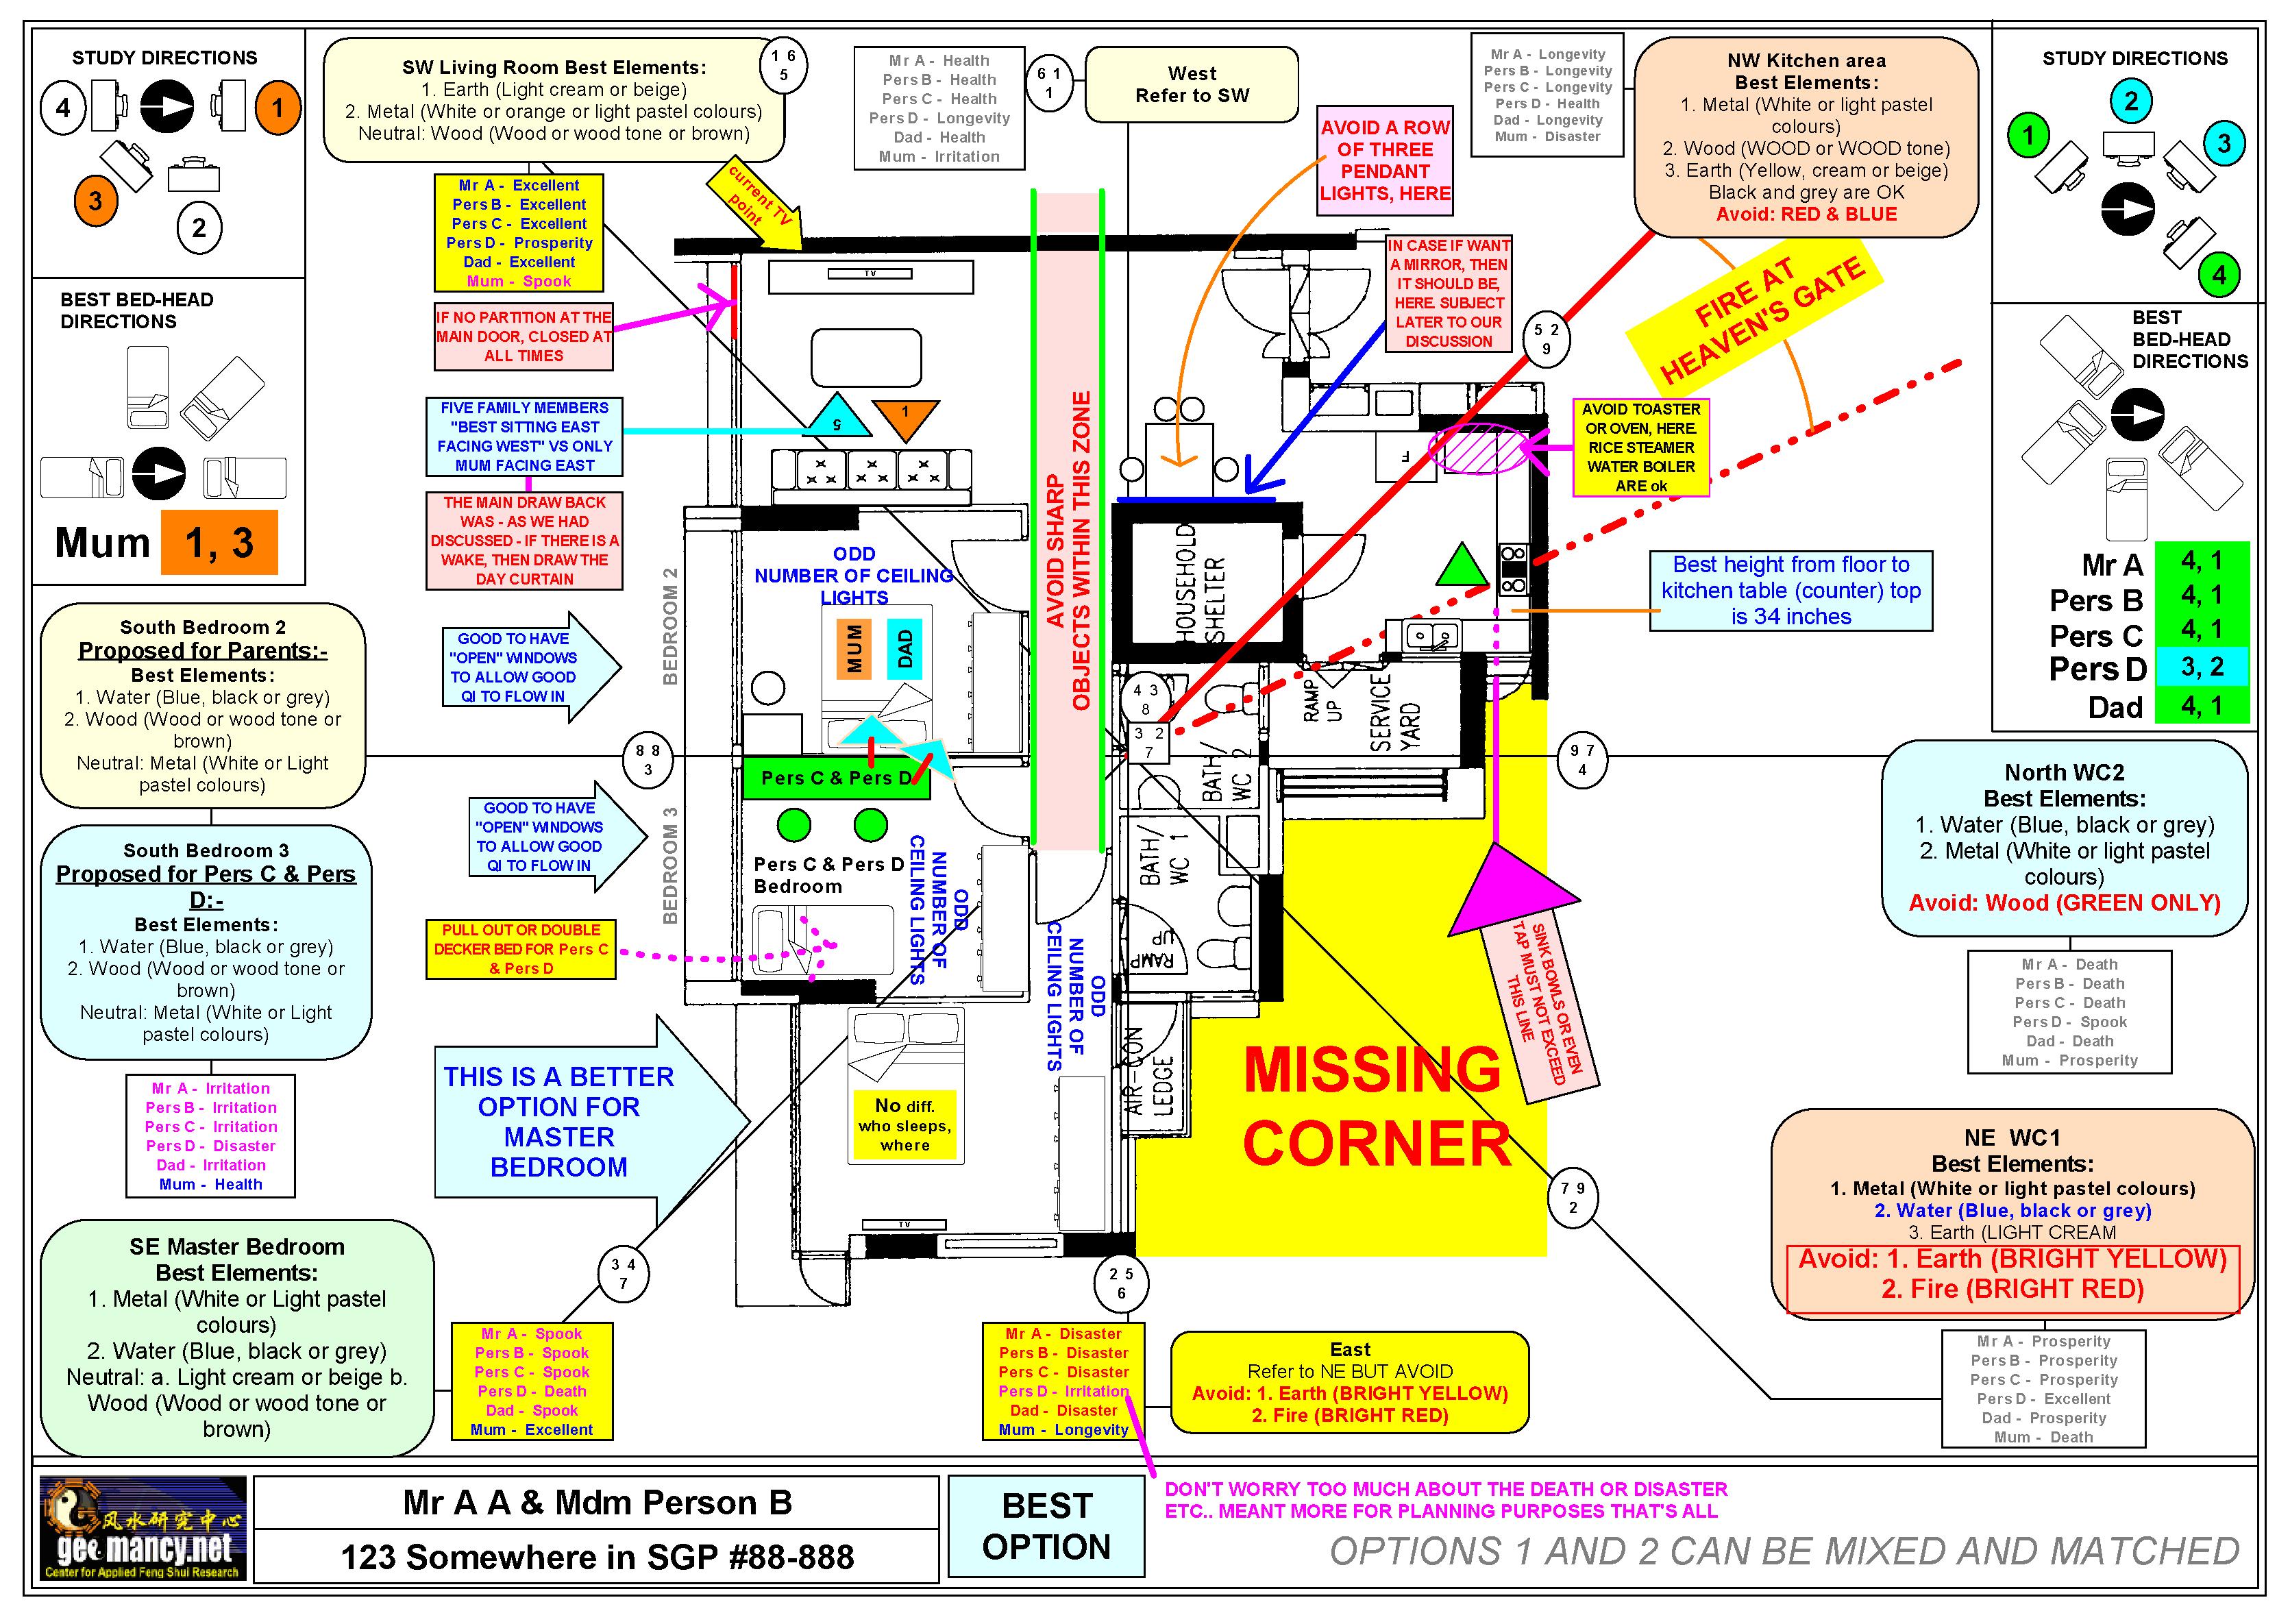 Hdb unit layout help general help fengshui geomancy net - Feng shui bedroom direction of bed ...